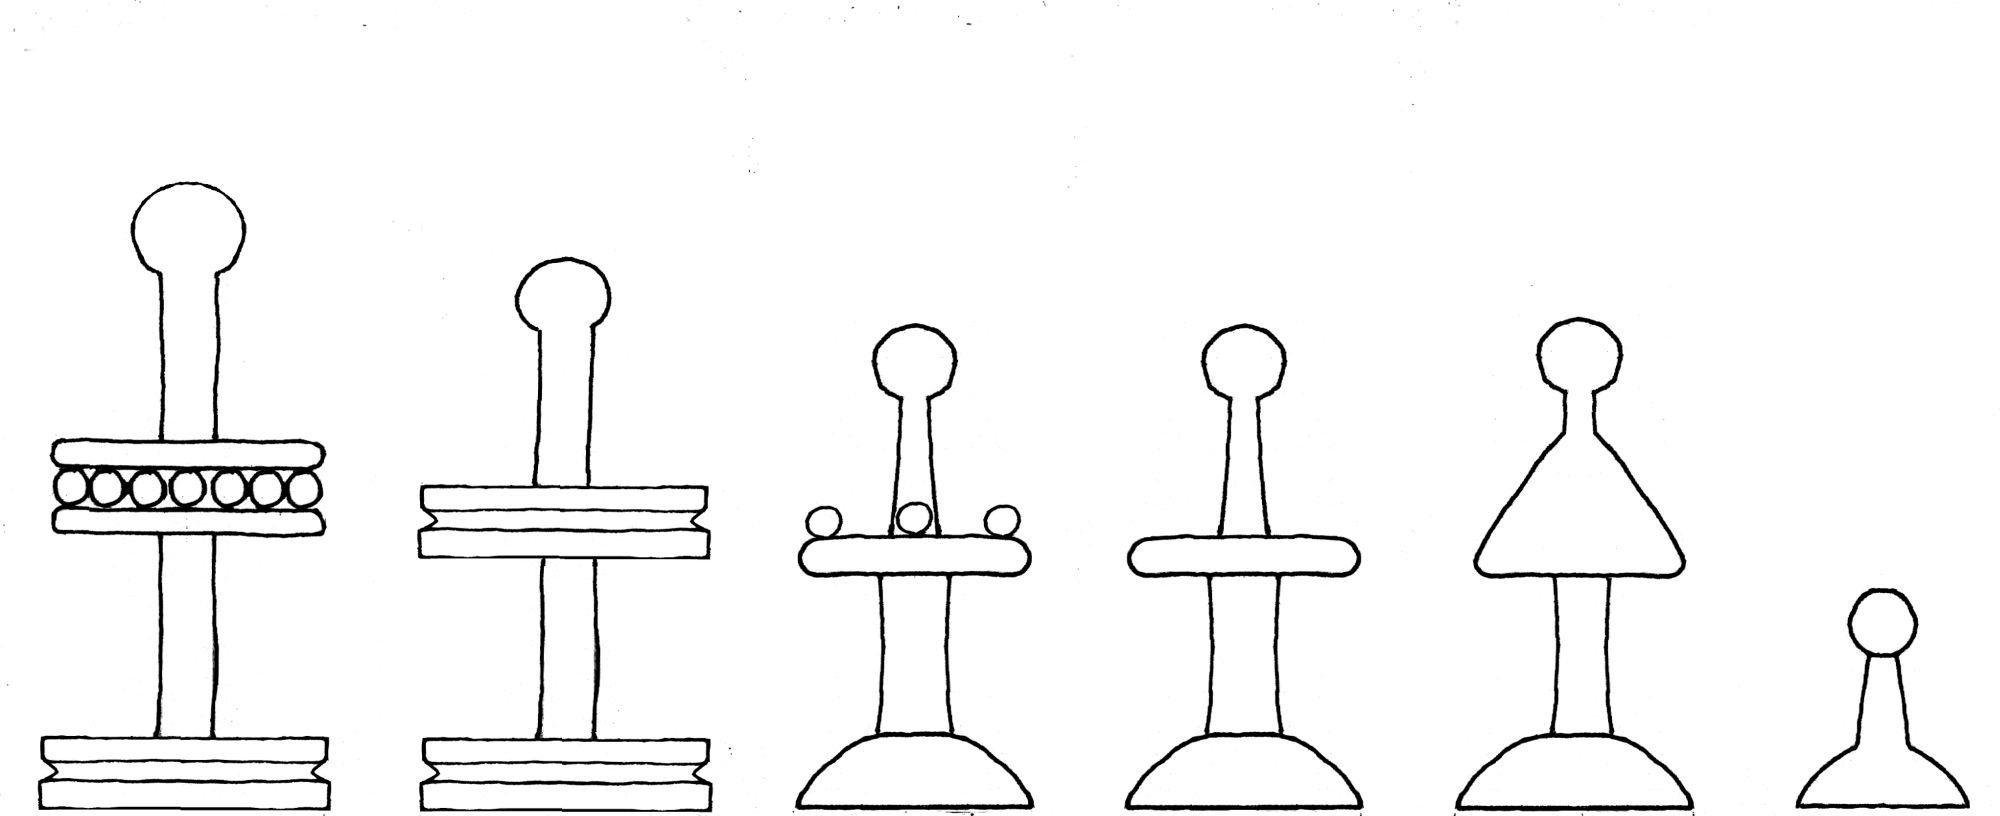 Regnault de Montauban chess set interpretive diagram